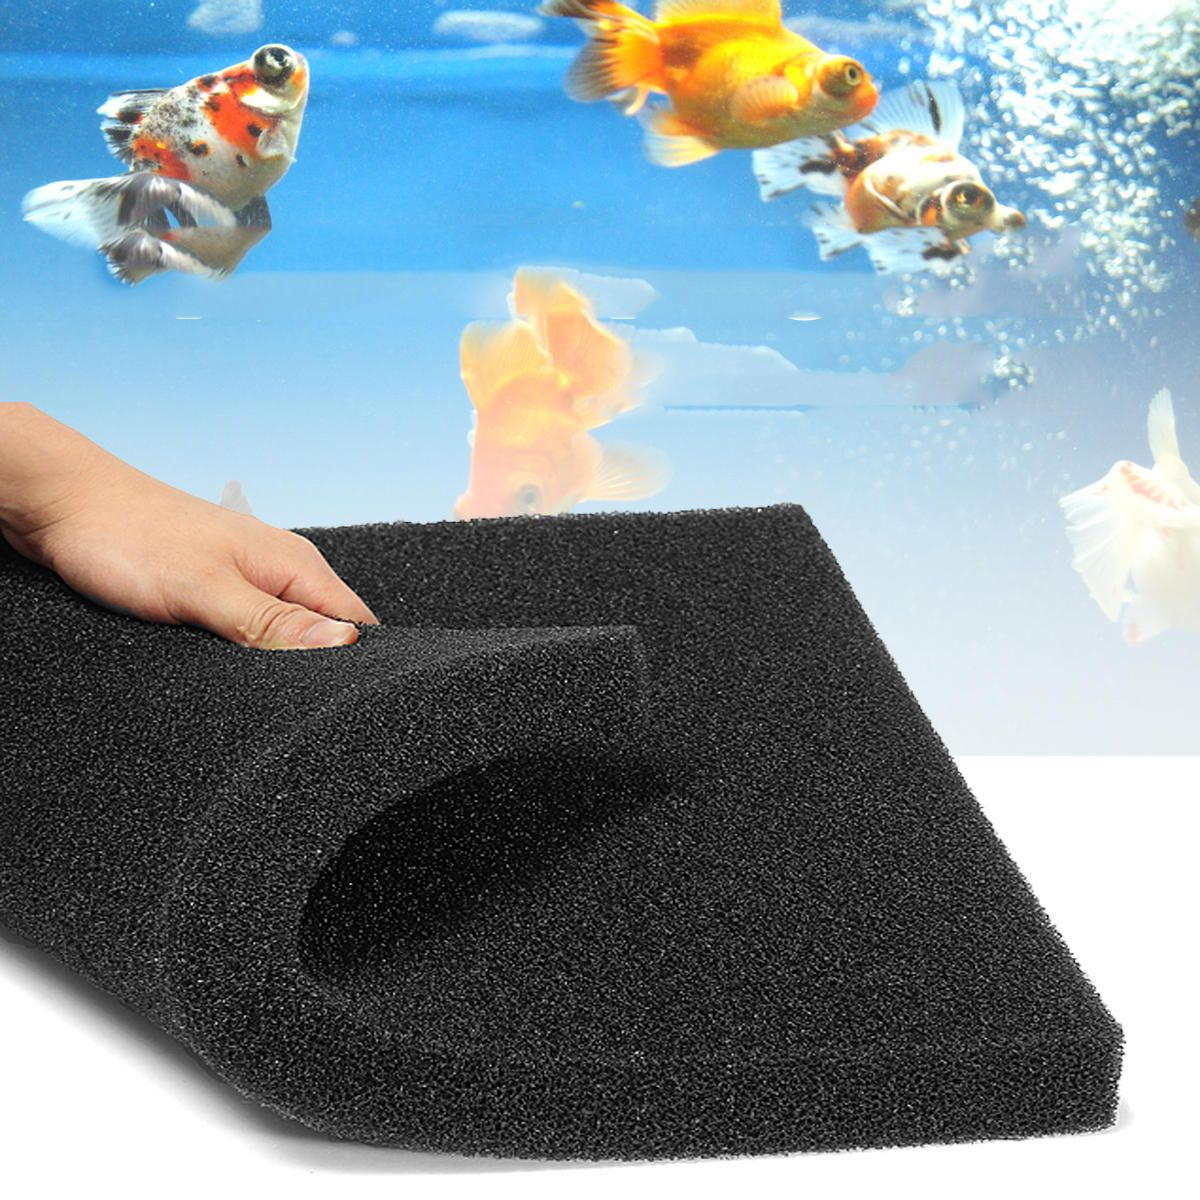 UKB US$7.18 1PCS  Biochemical Filter Foam Fish Pond Filtration Tank Aquarium Sponge Pad Aquarium Filter 50cm